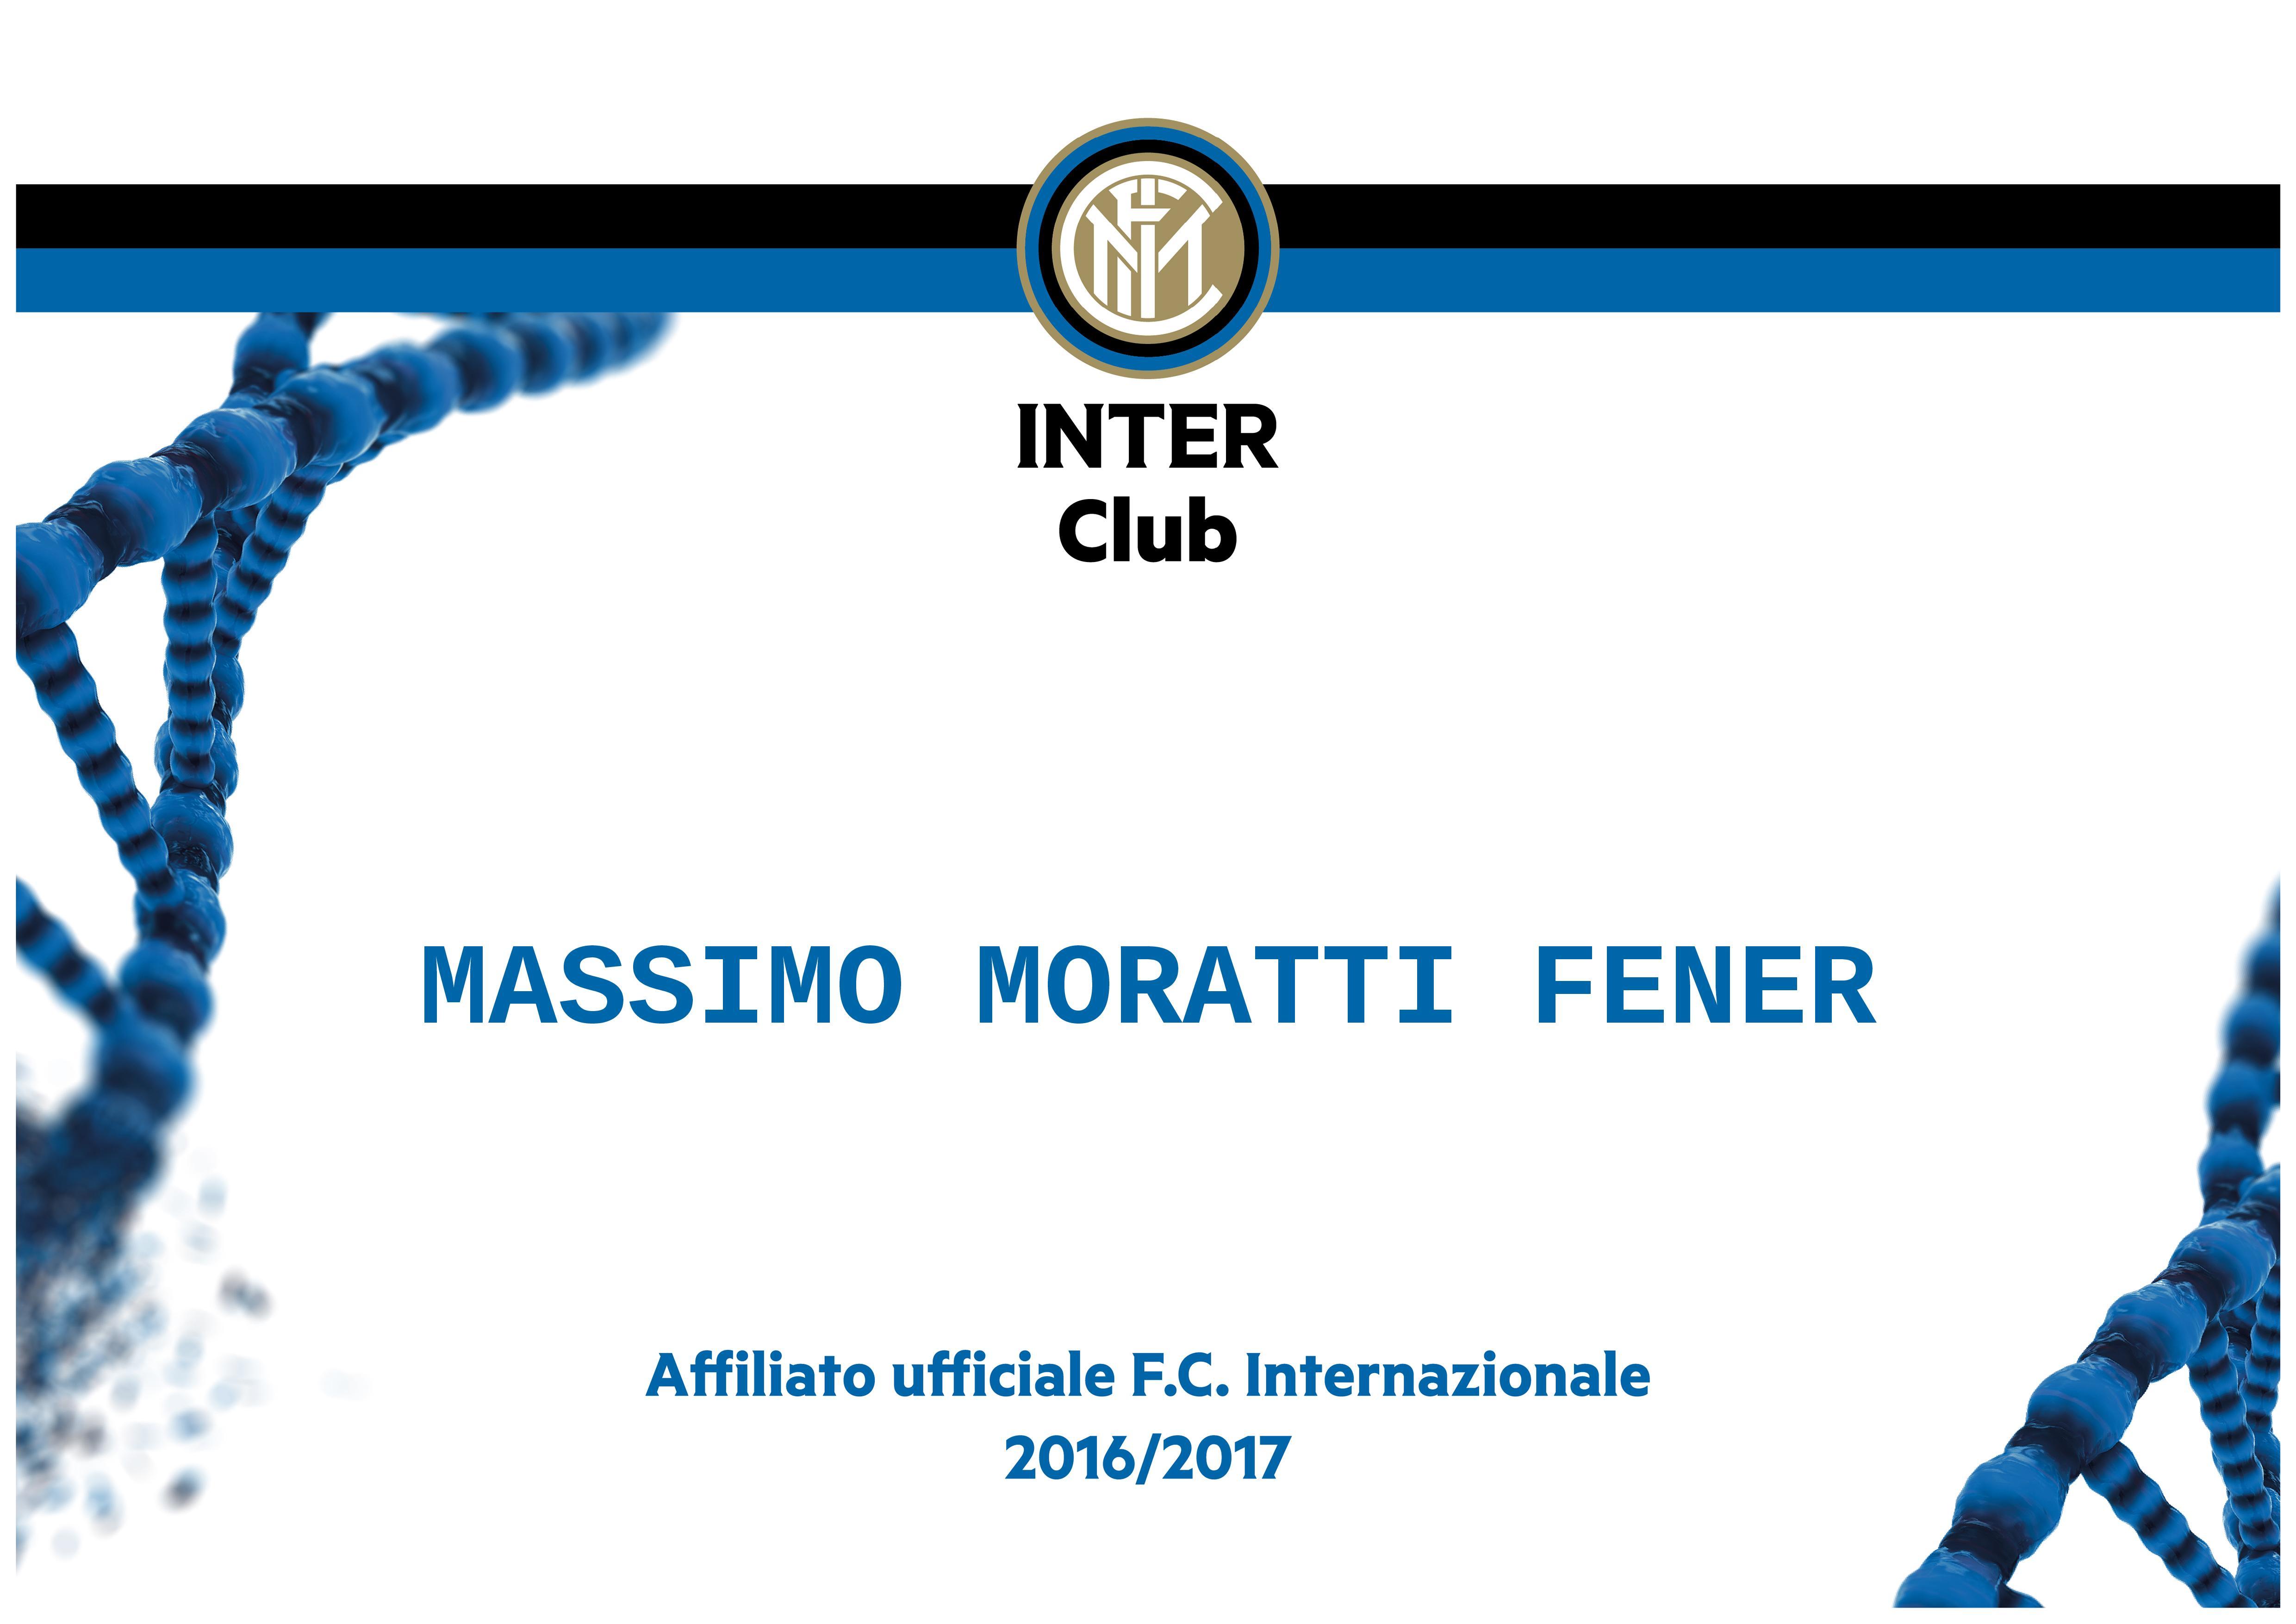 certificato-fener-page-001